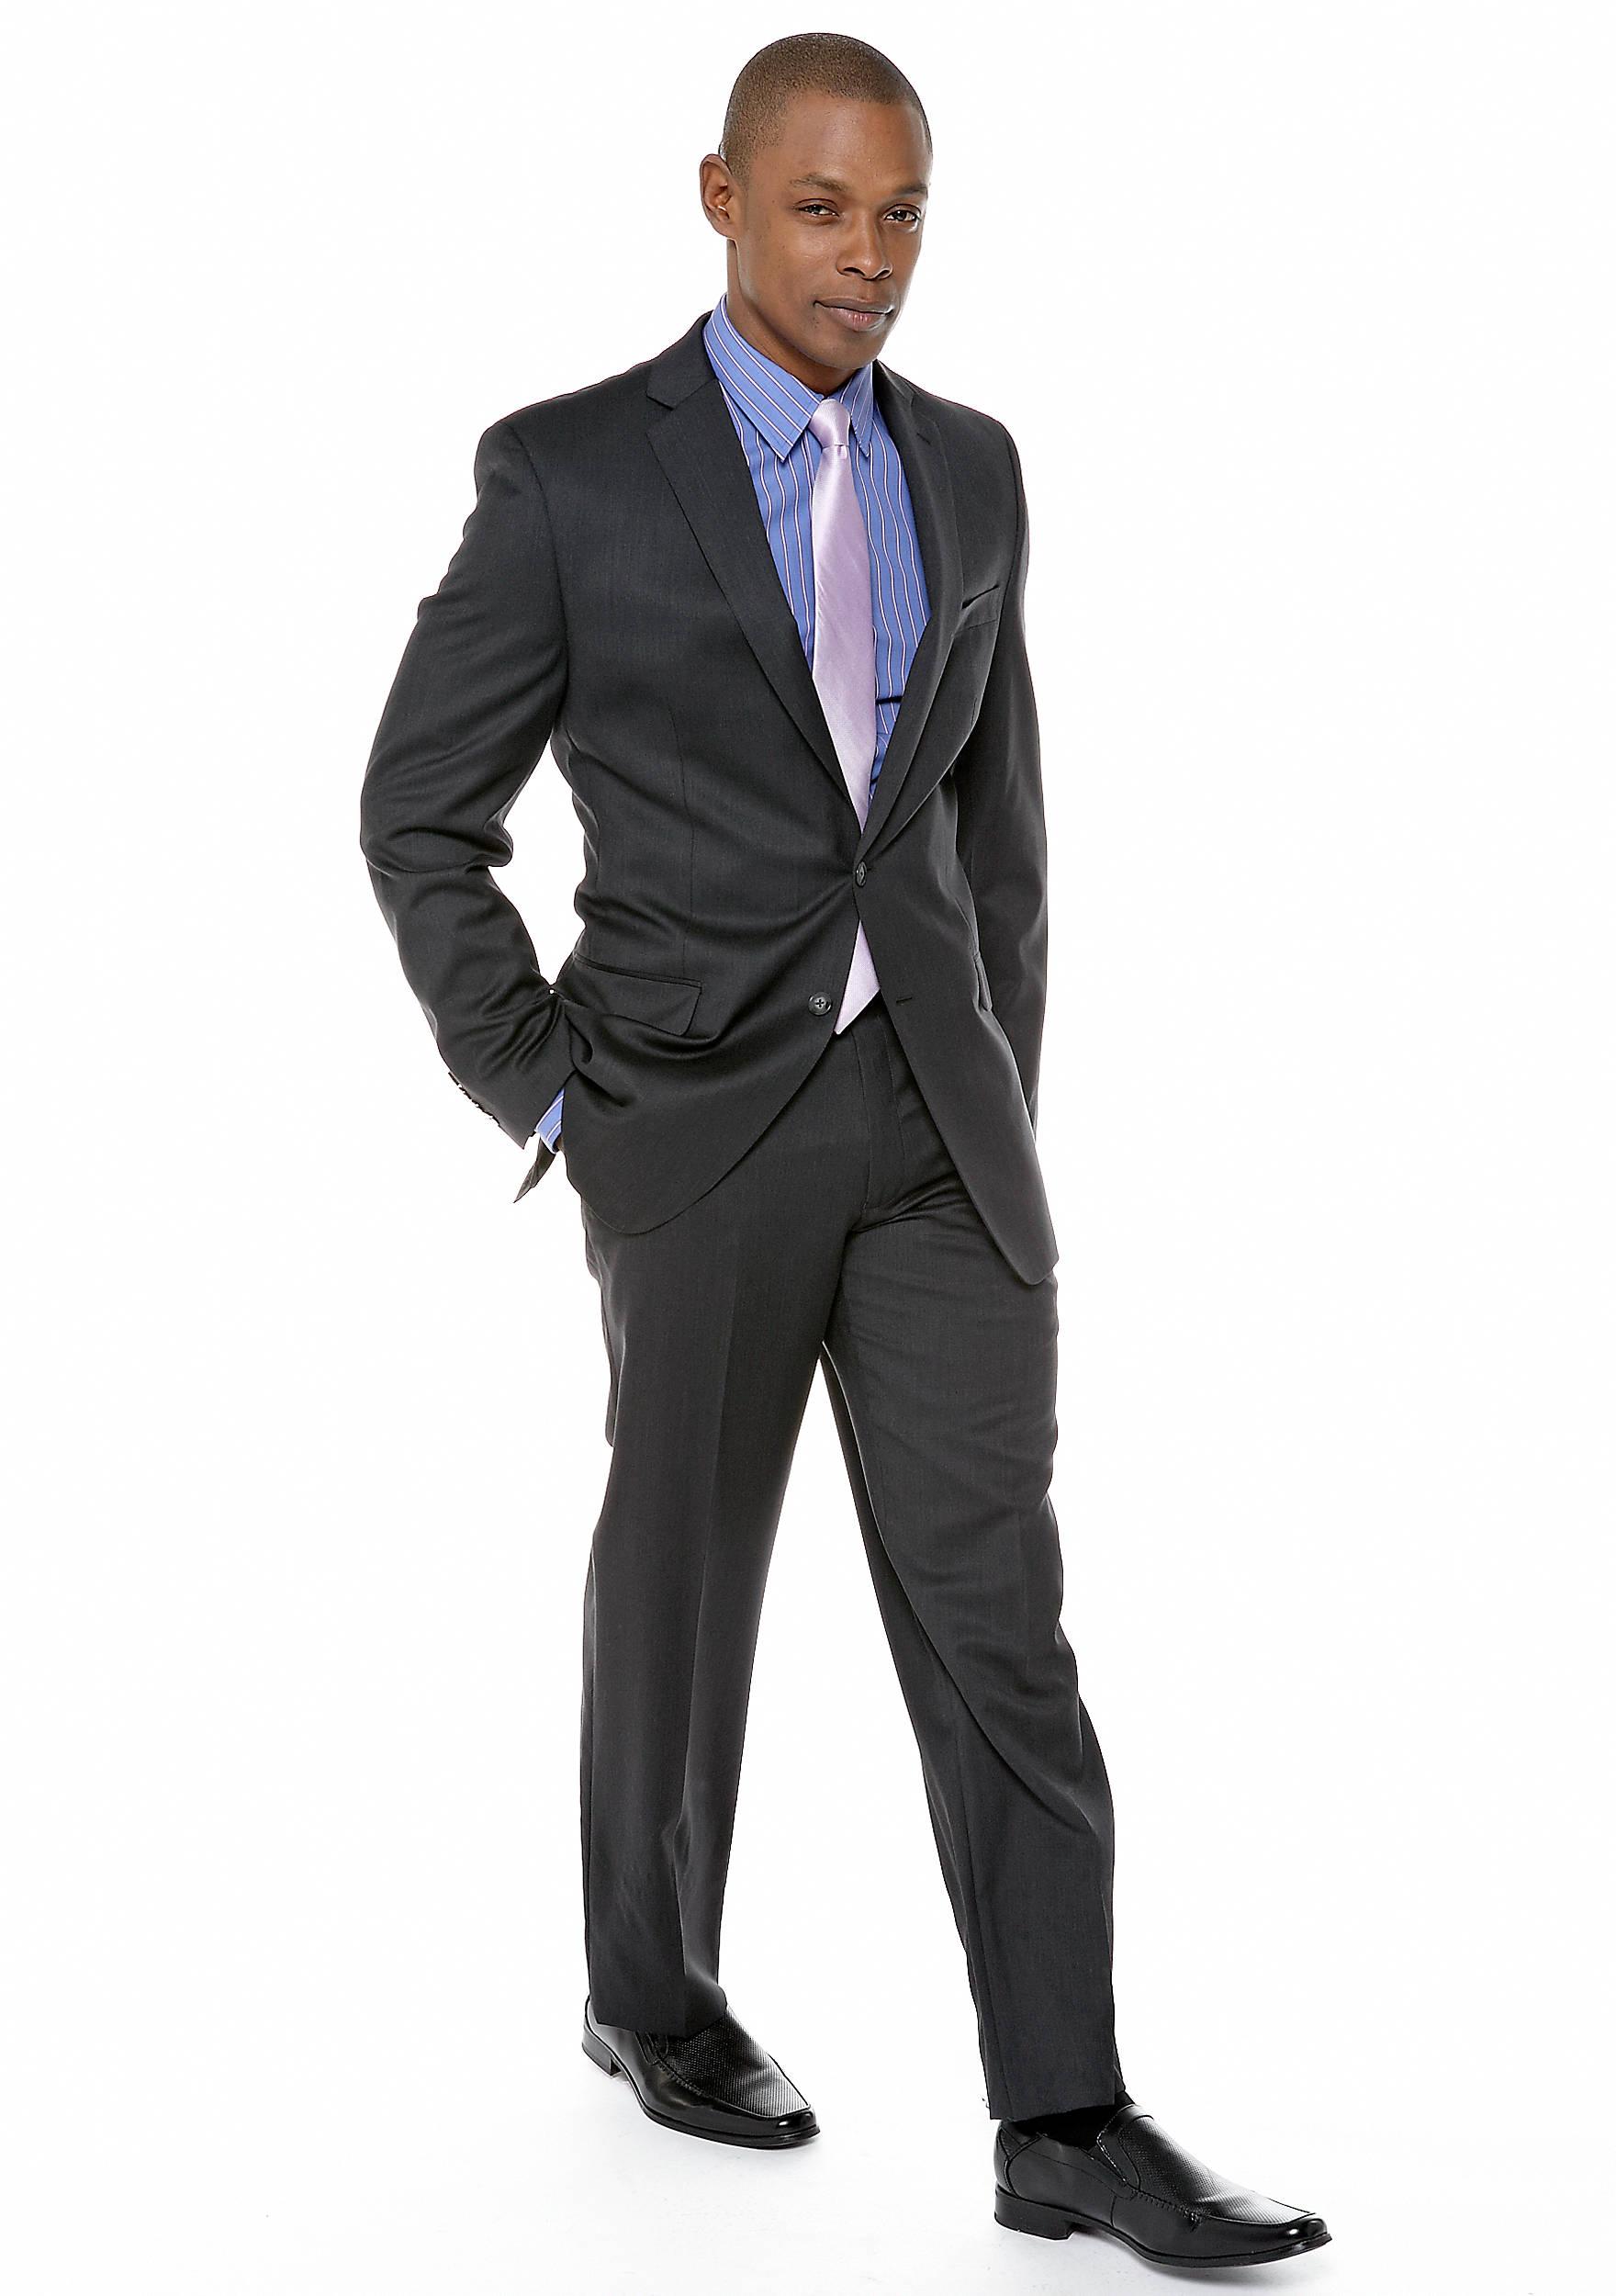 Calvin Klein Slim Fit Charcoal Suit | belk